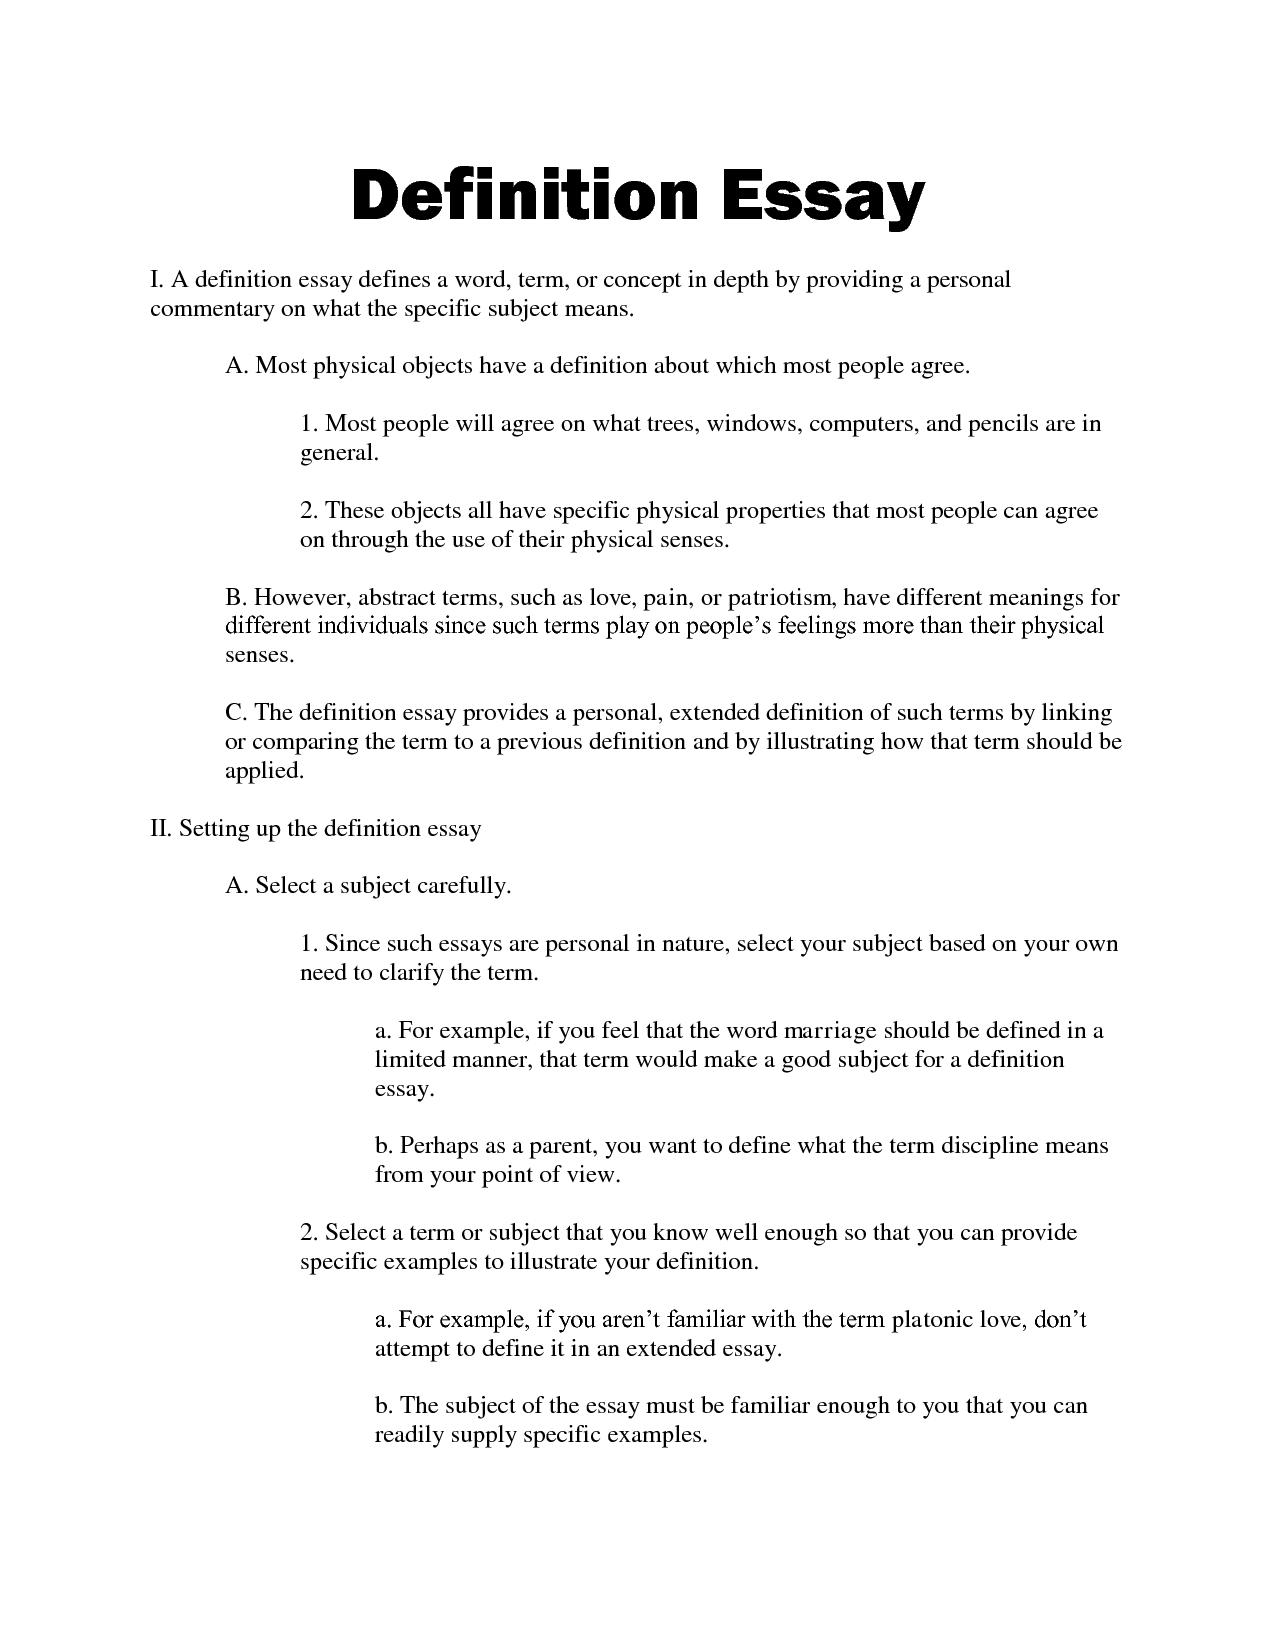 002 Gj60o8orim Definition Essay Outline Unique Writing Pdf Hero Example Success Full